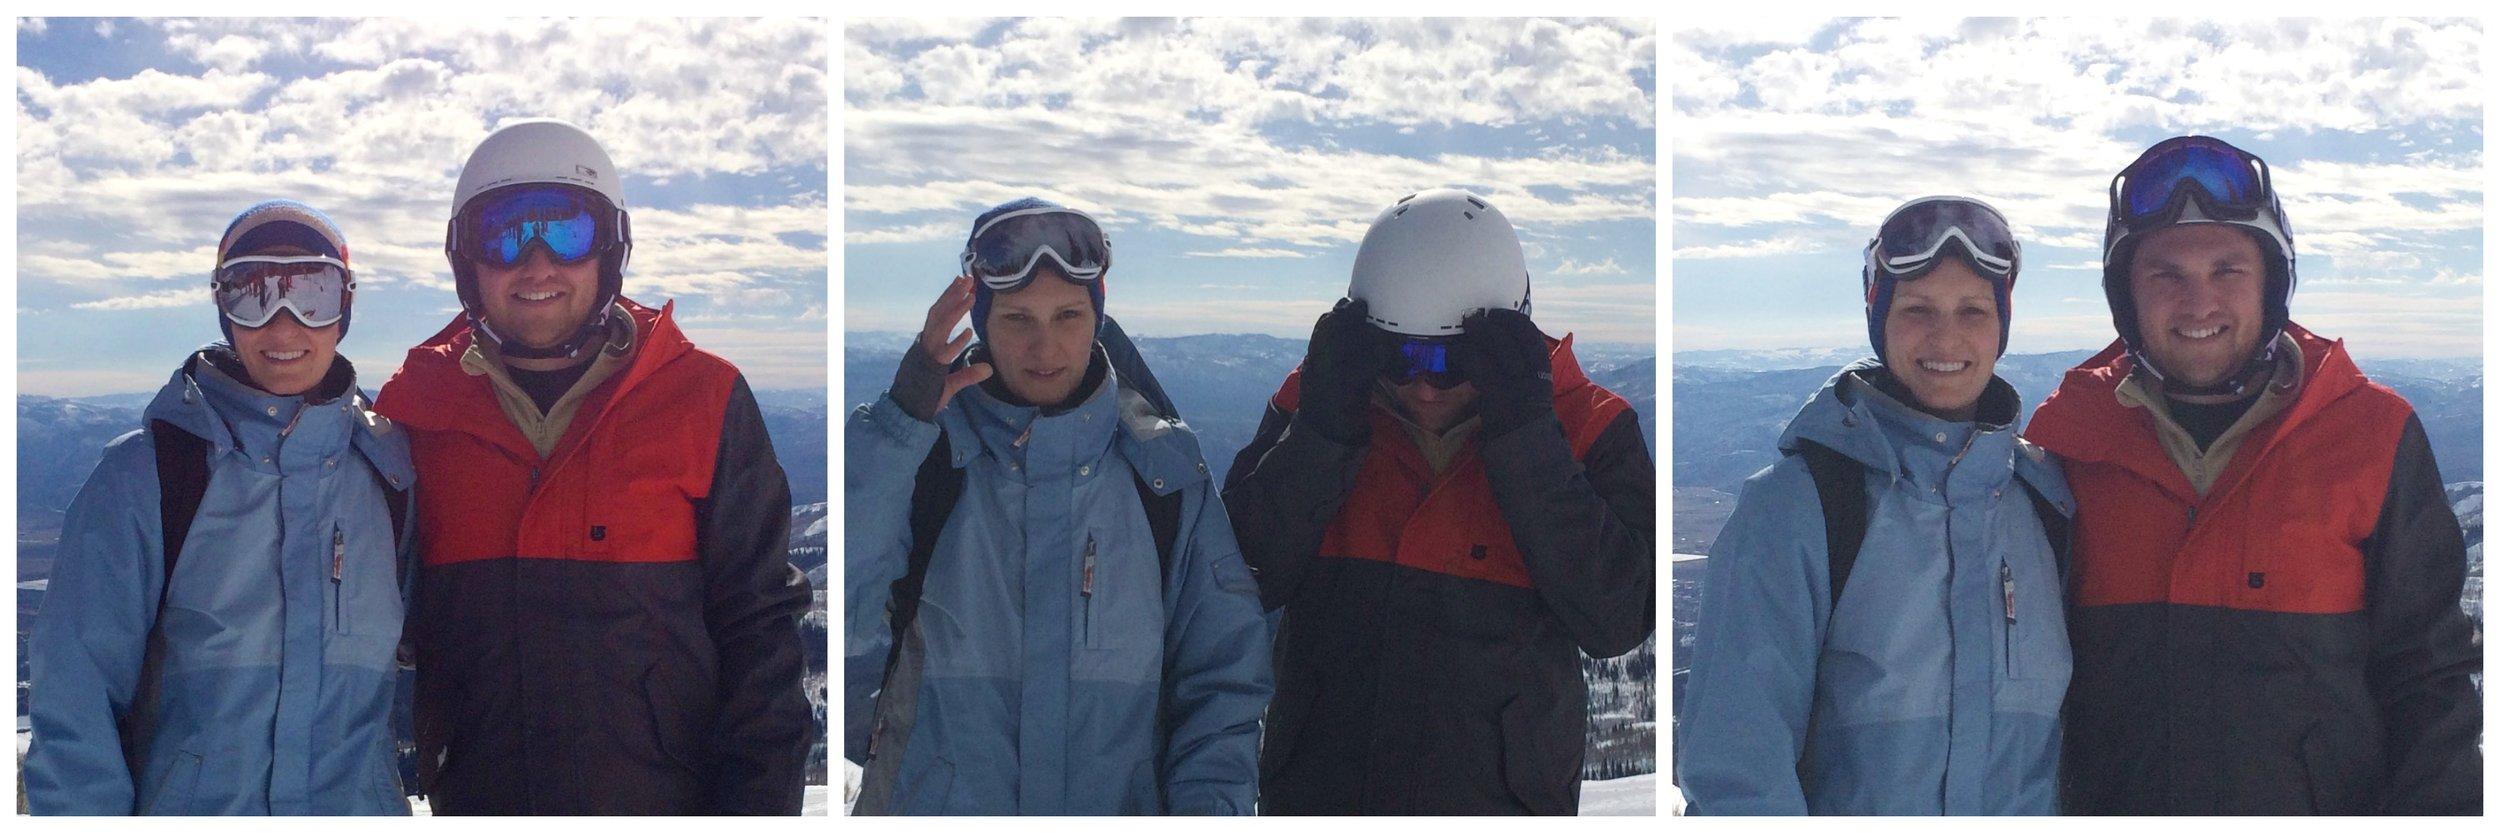 photos at brighton ski resort